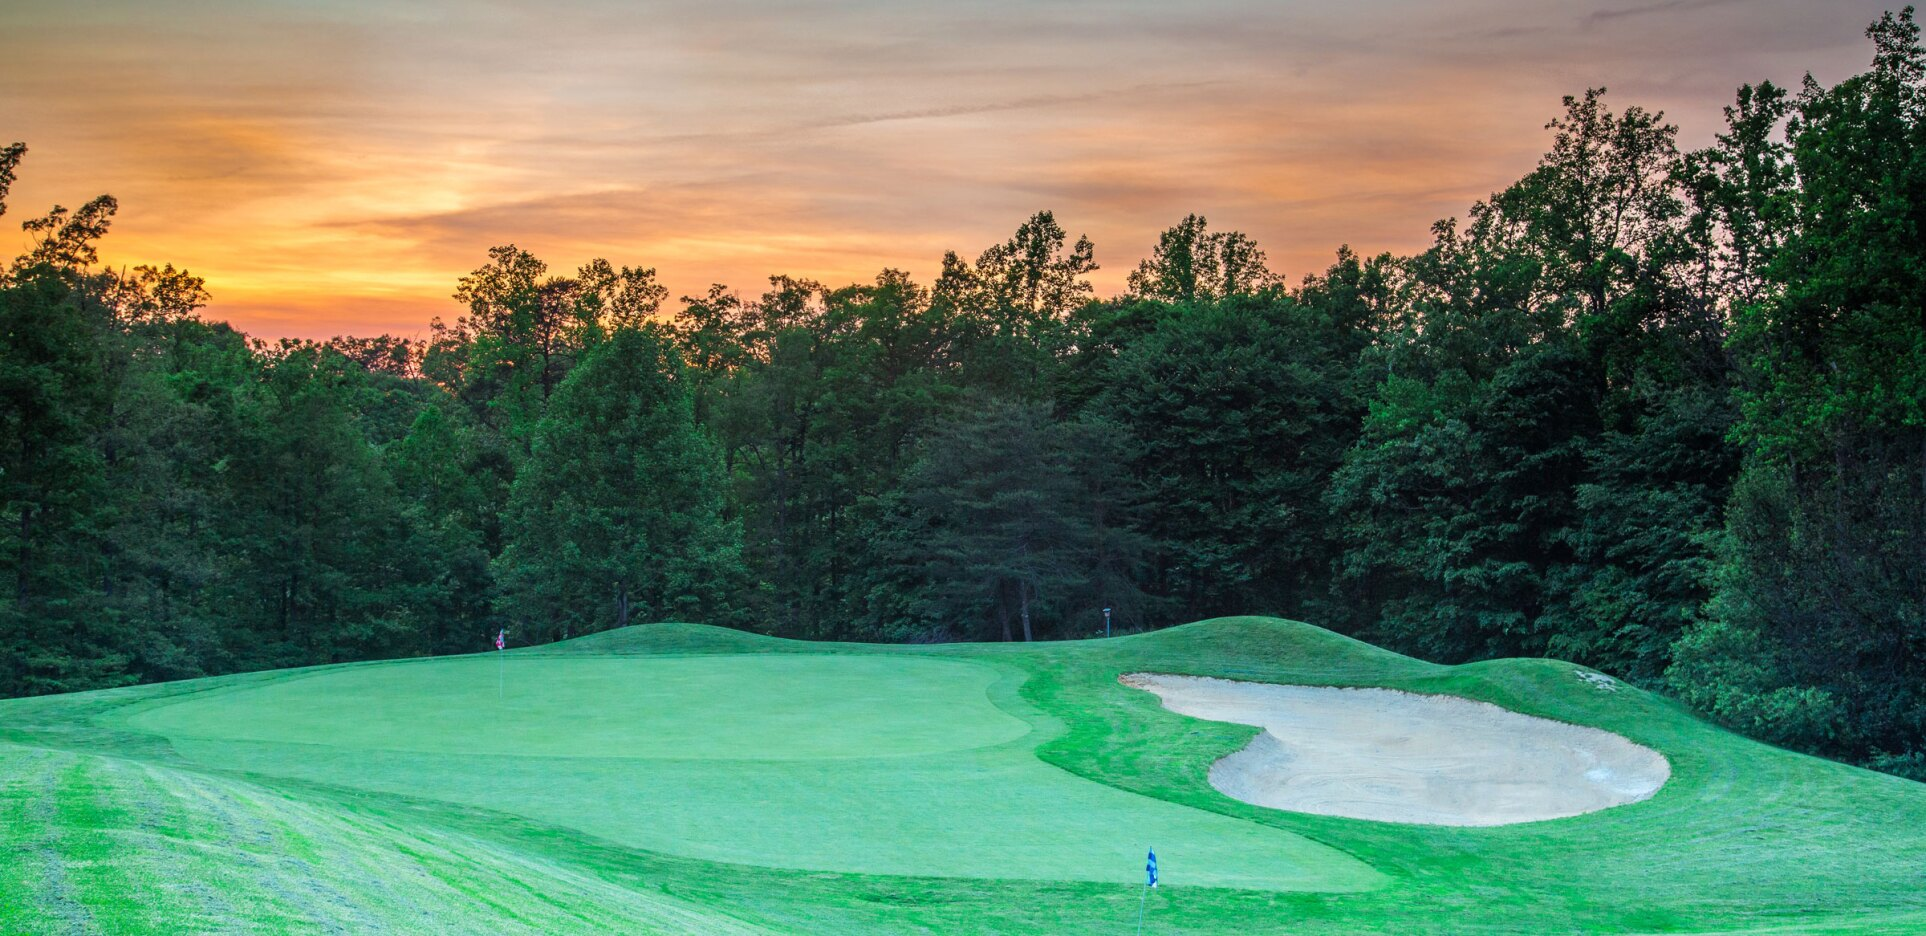 Lake Ridge Golf Course, sunset